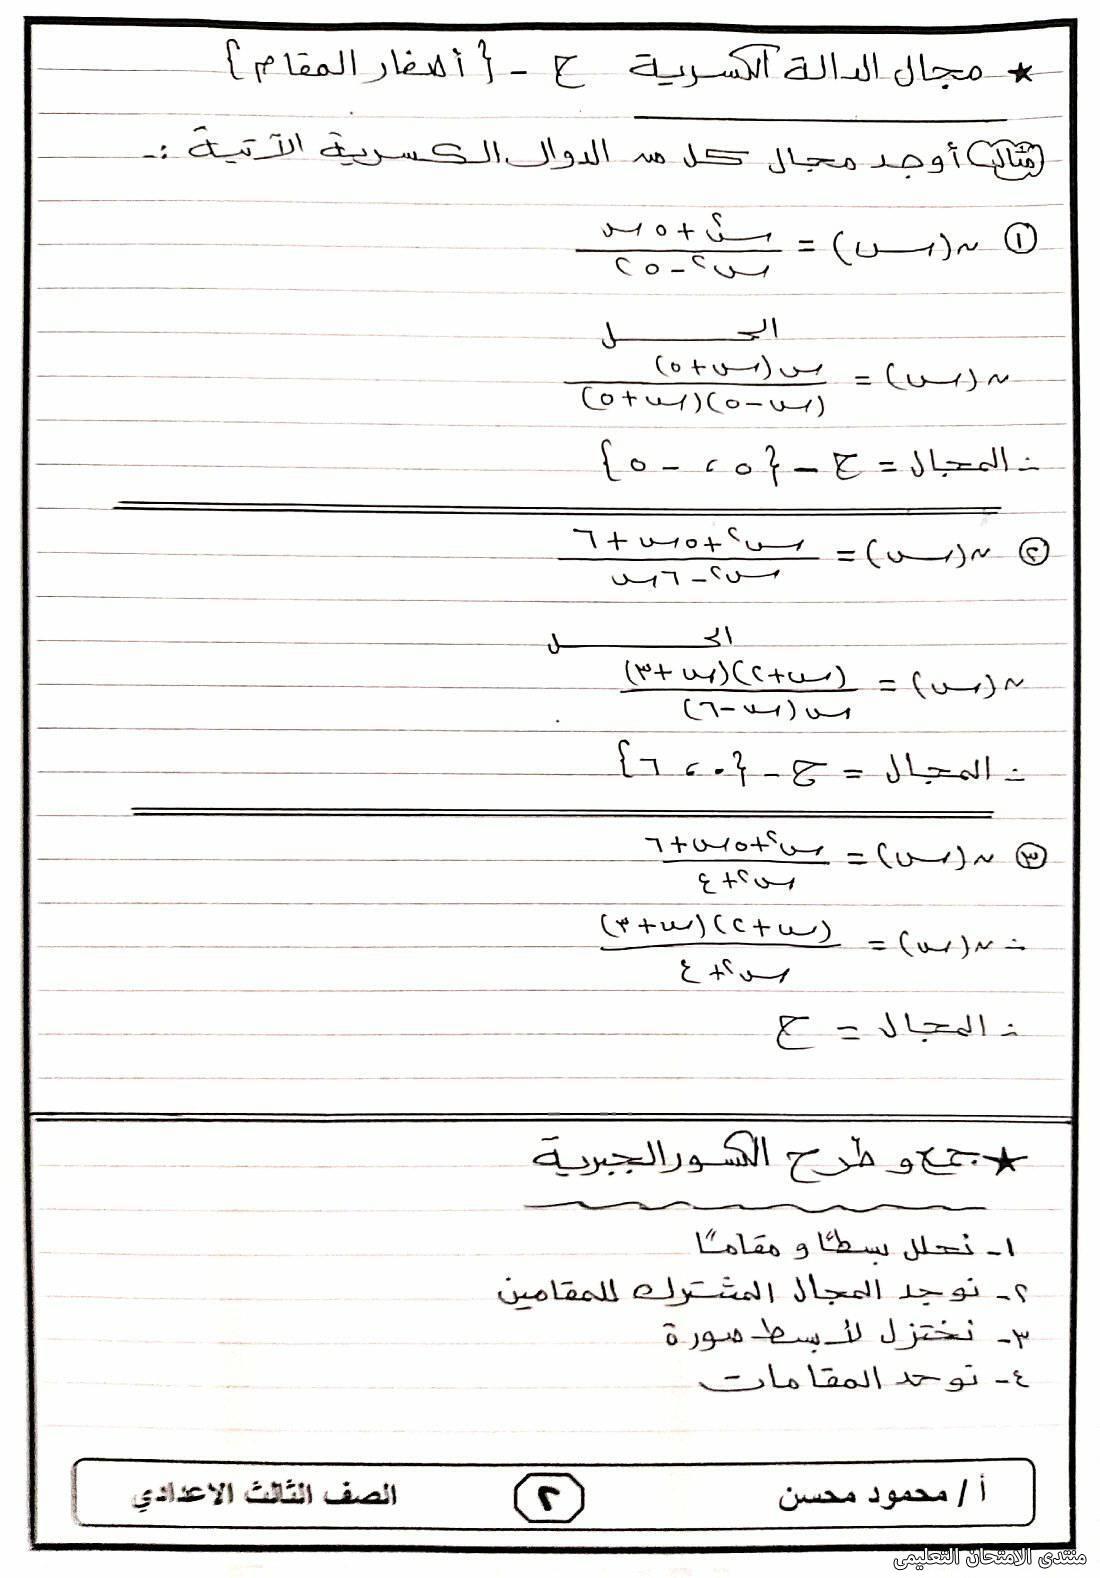 exam-eg.com_162035653506864.jpg